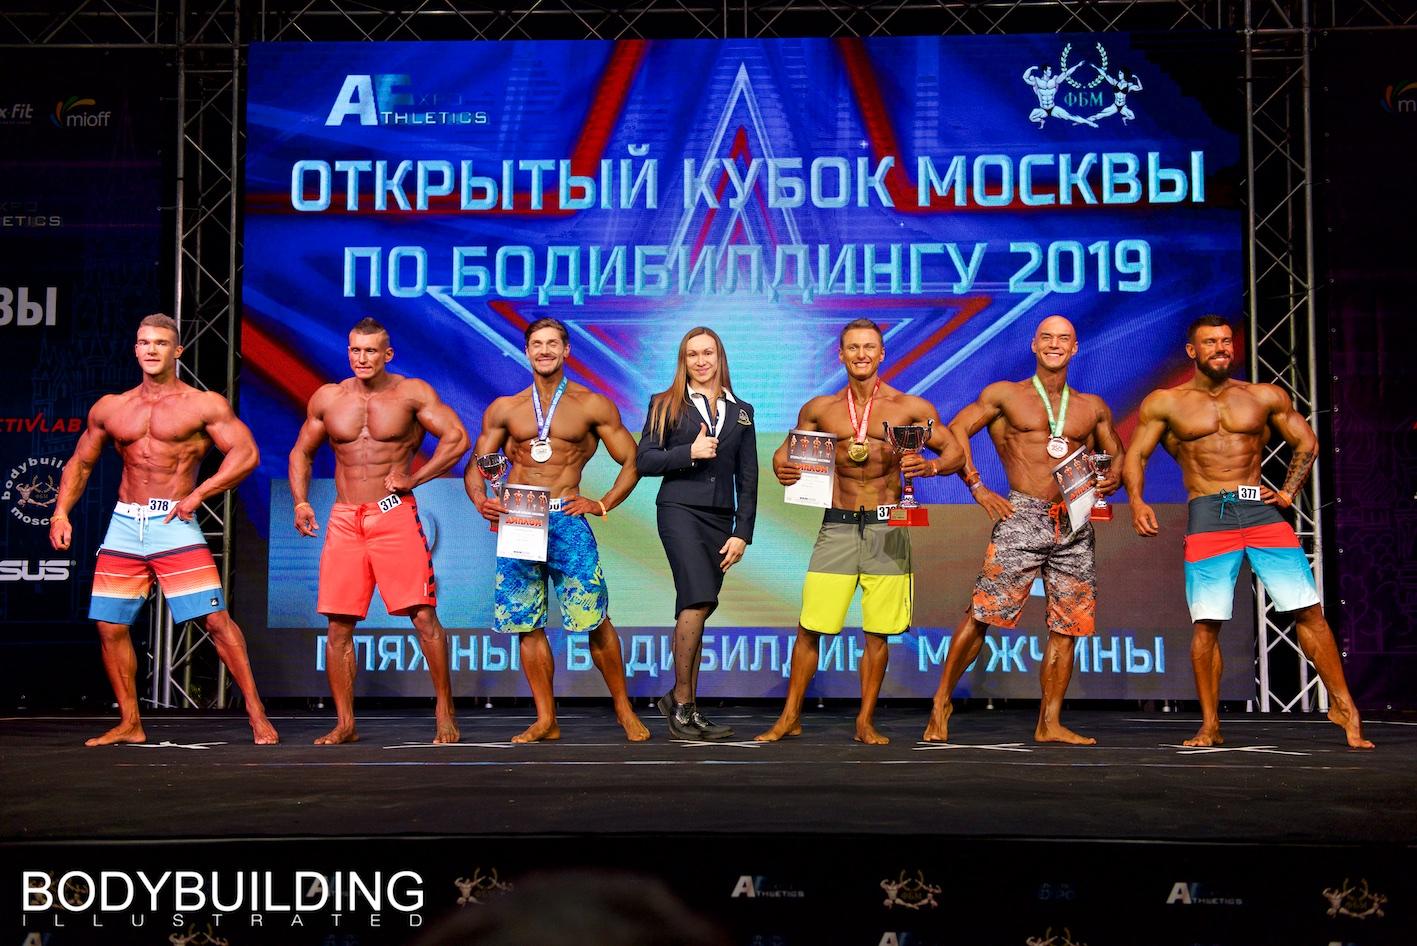 Кубок Москвы по бодибилдингу 2019 Пляжный бодибилдинг мускуляры